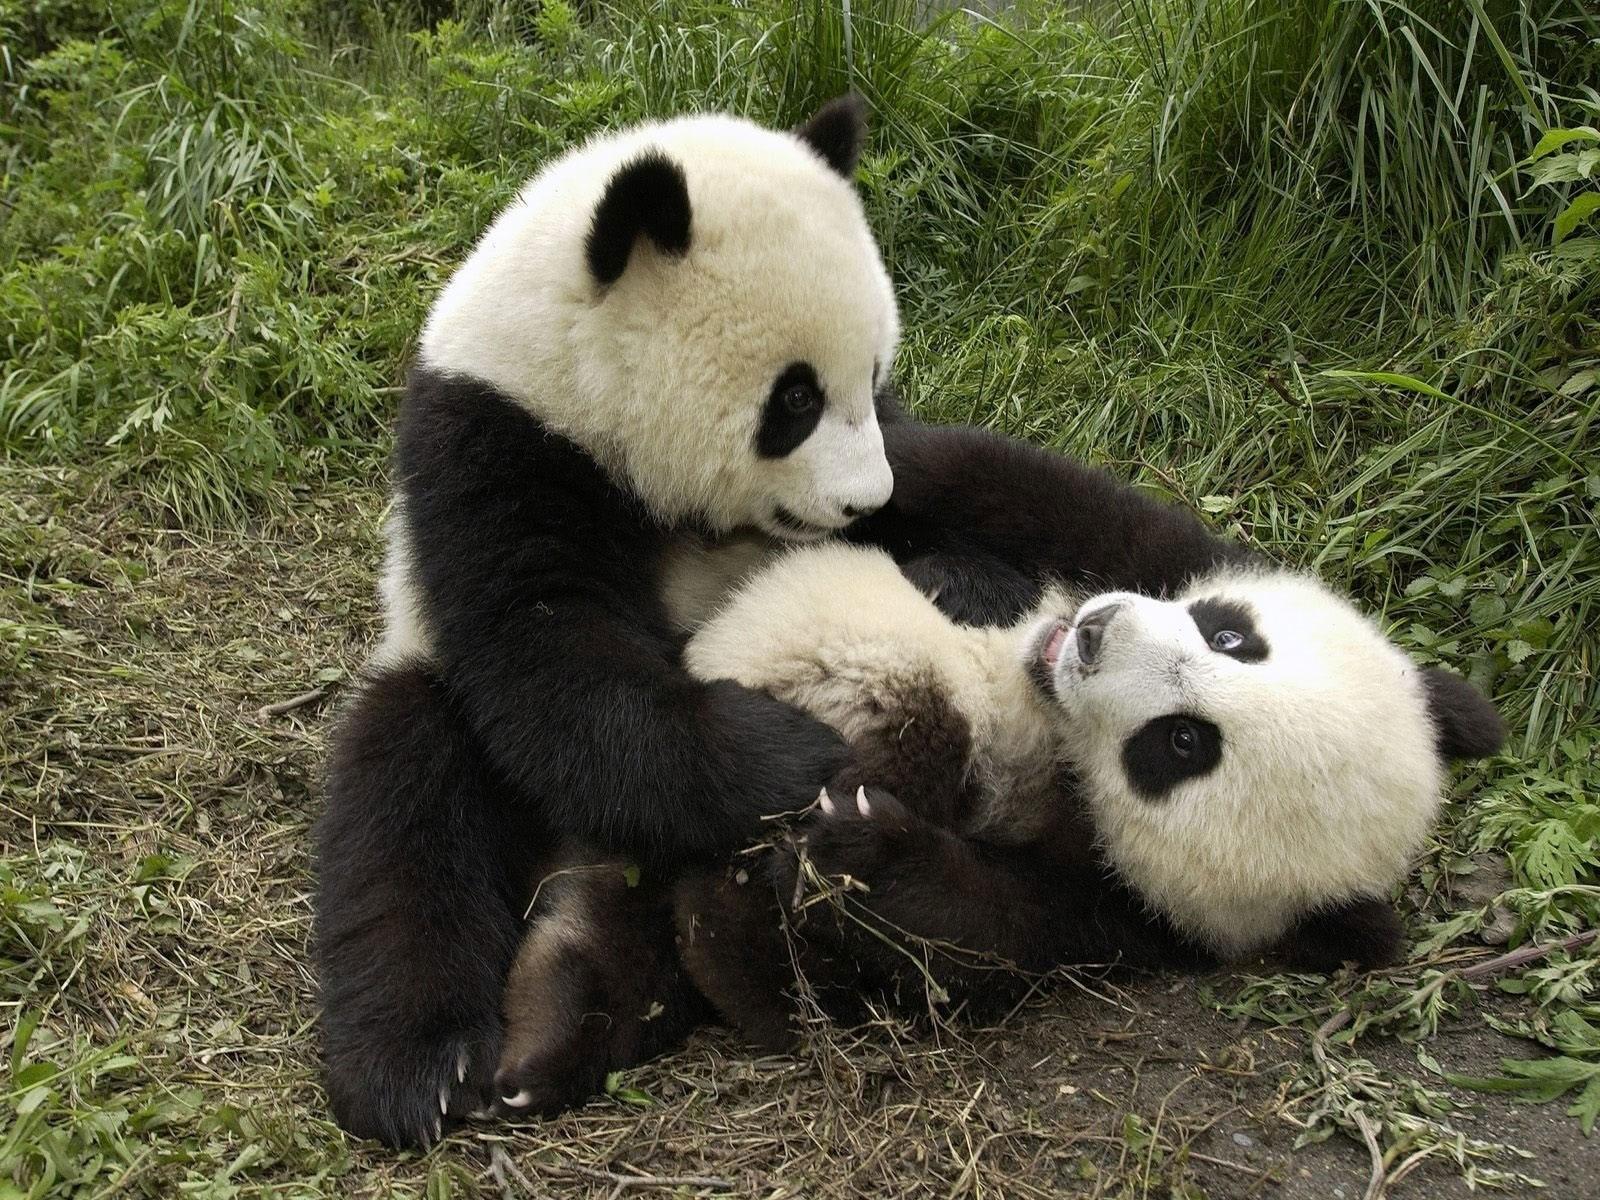 panda wallpapers for deskto